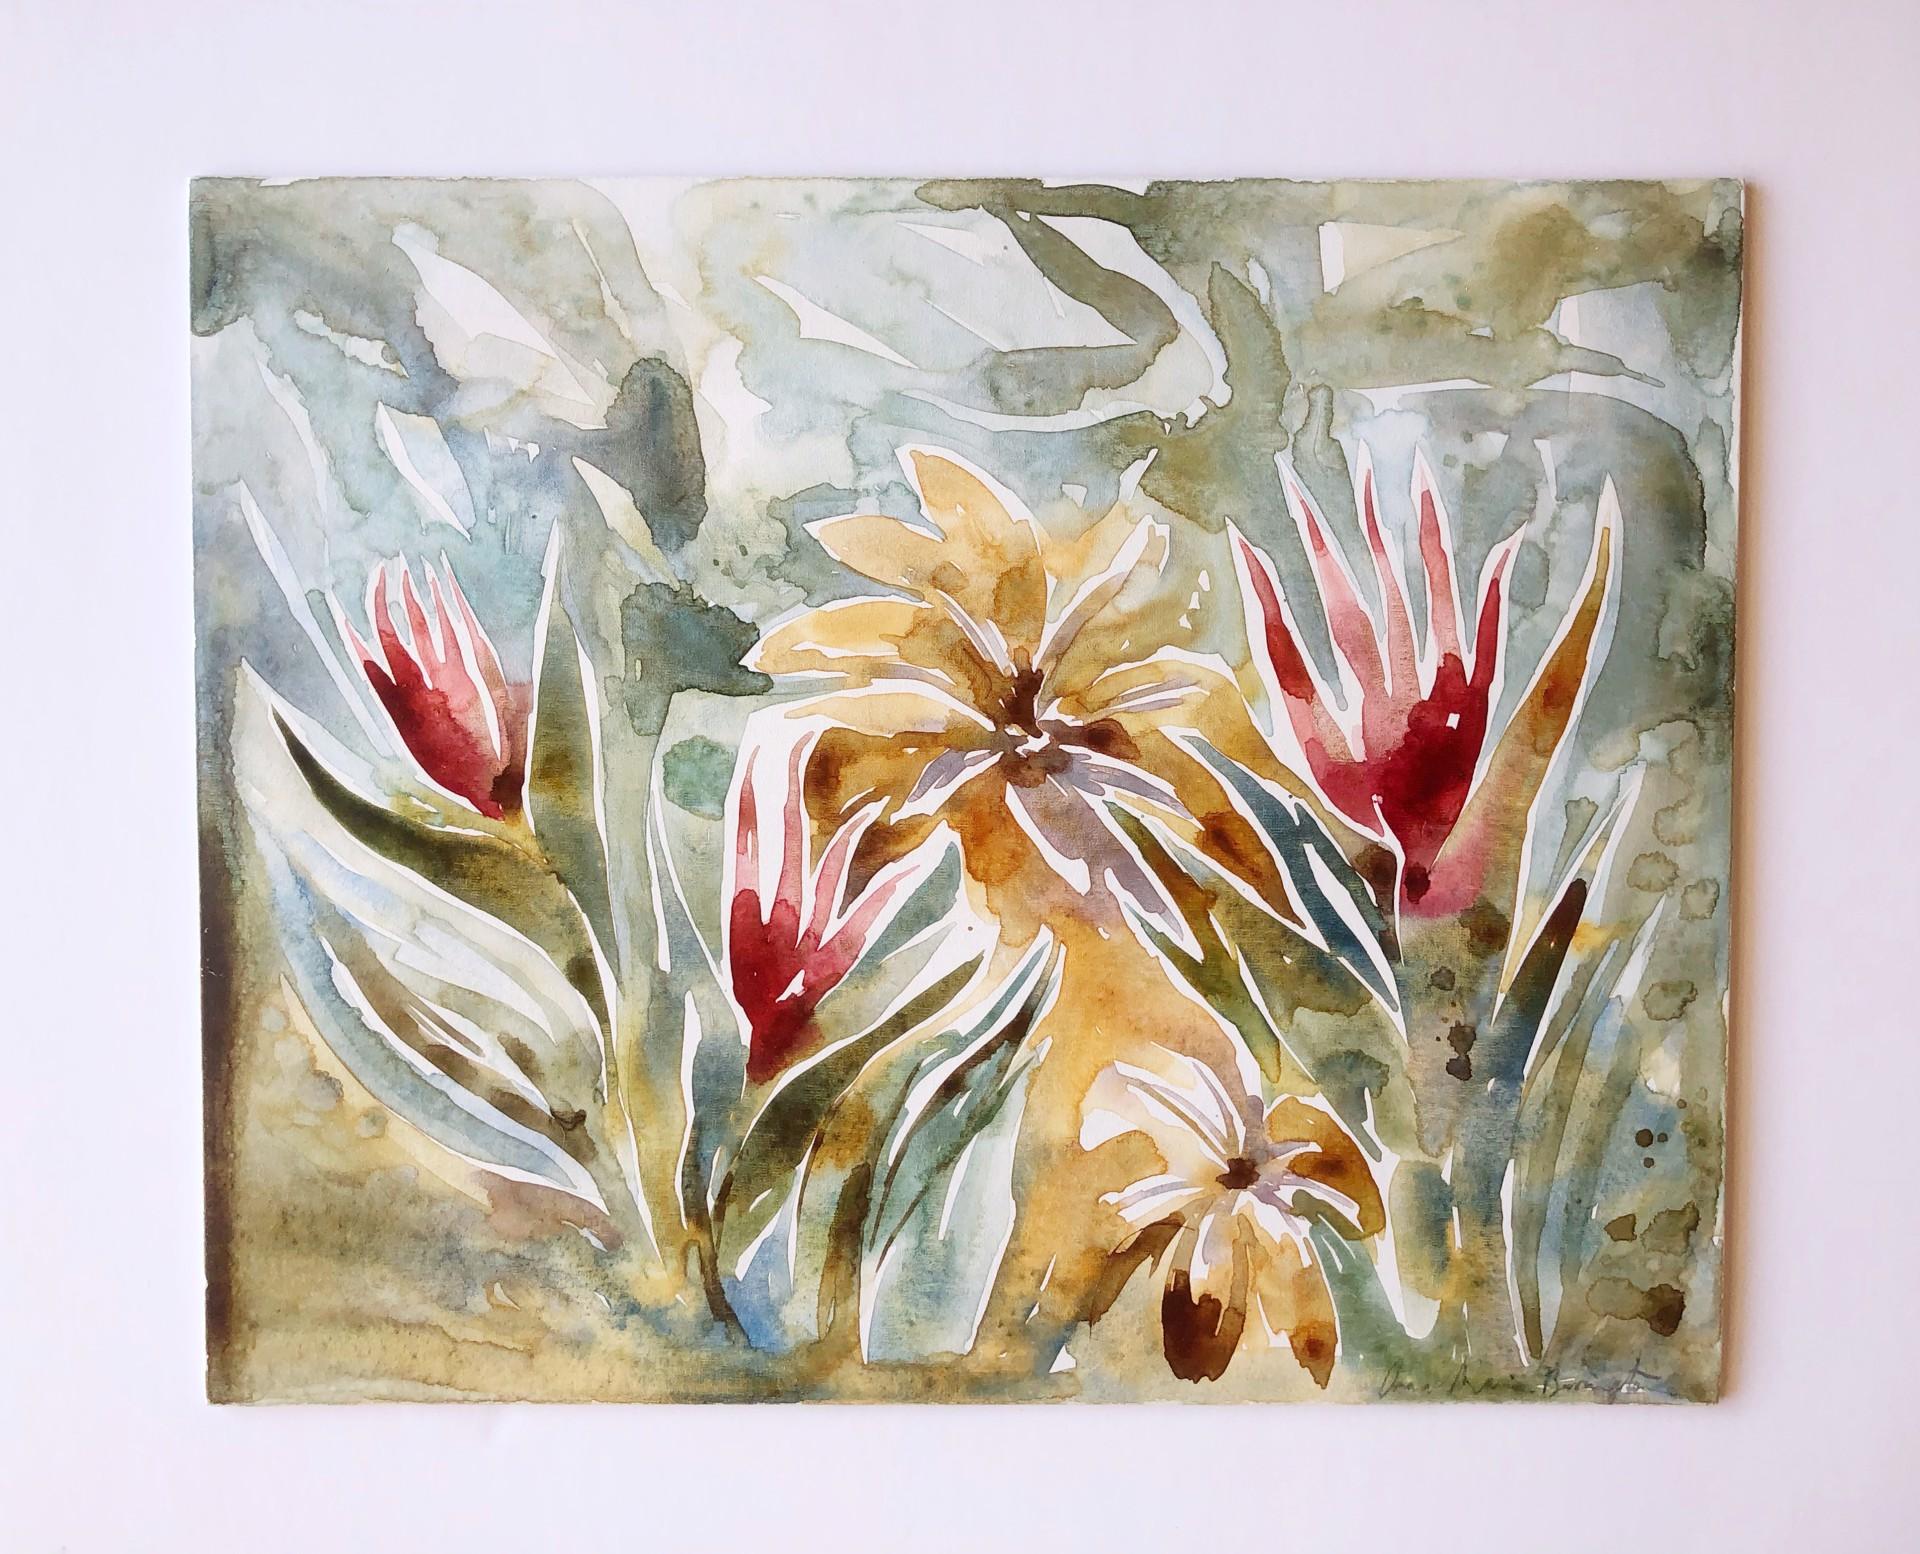 Blossom II by Anna-Marie Babington